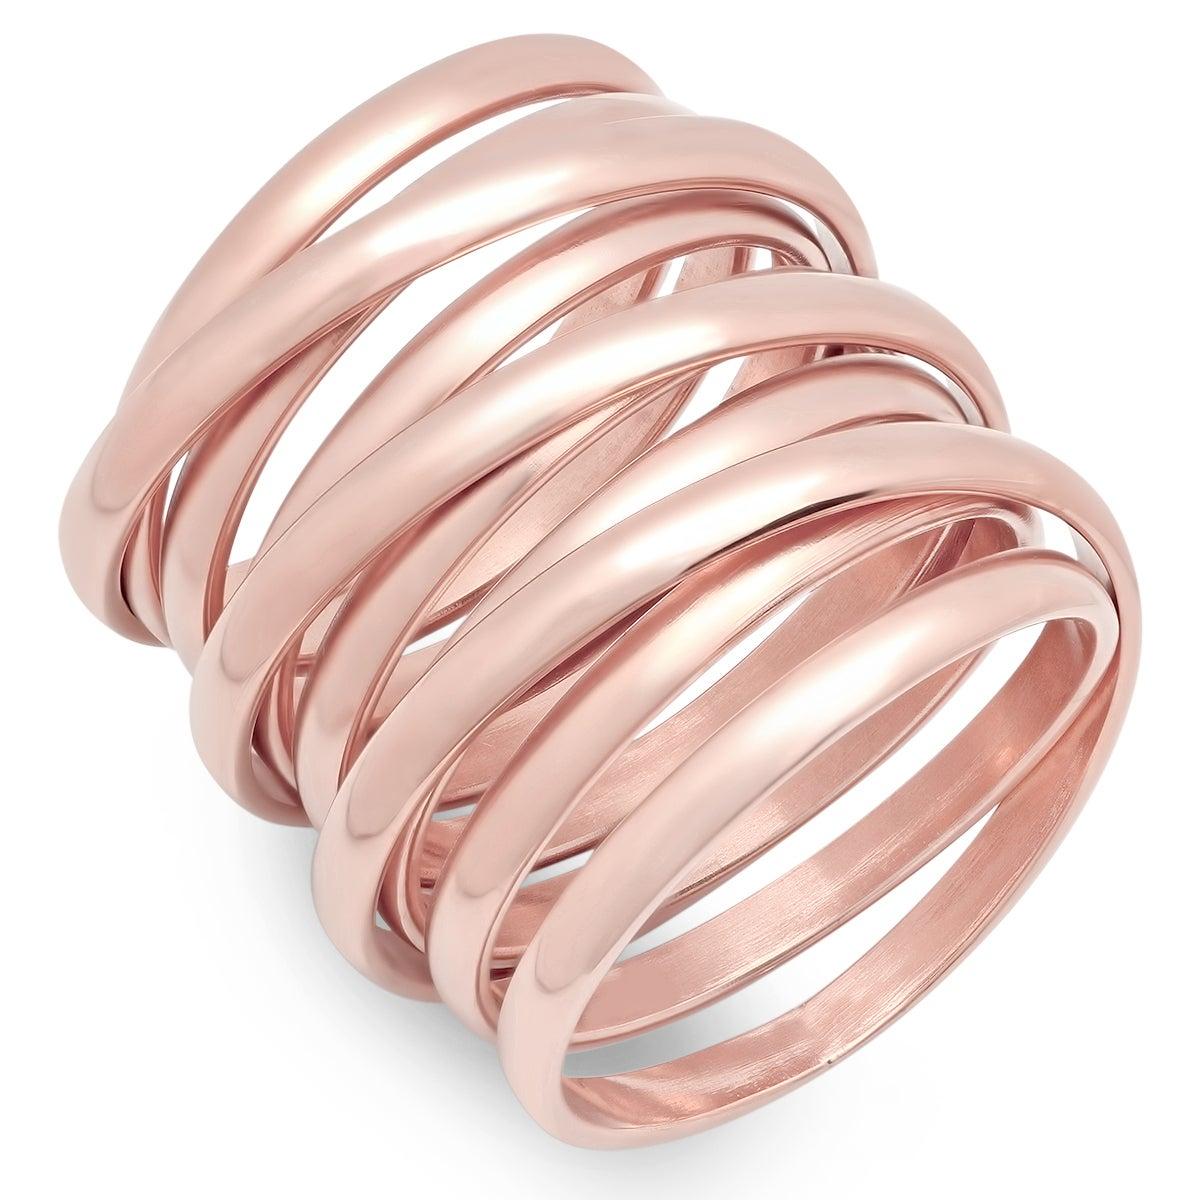 Shop Piatella Ladies Stainless Steel Multiwrap Ring in 3 colors - On ...